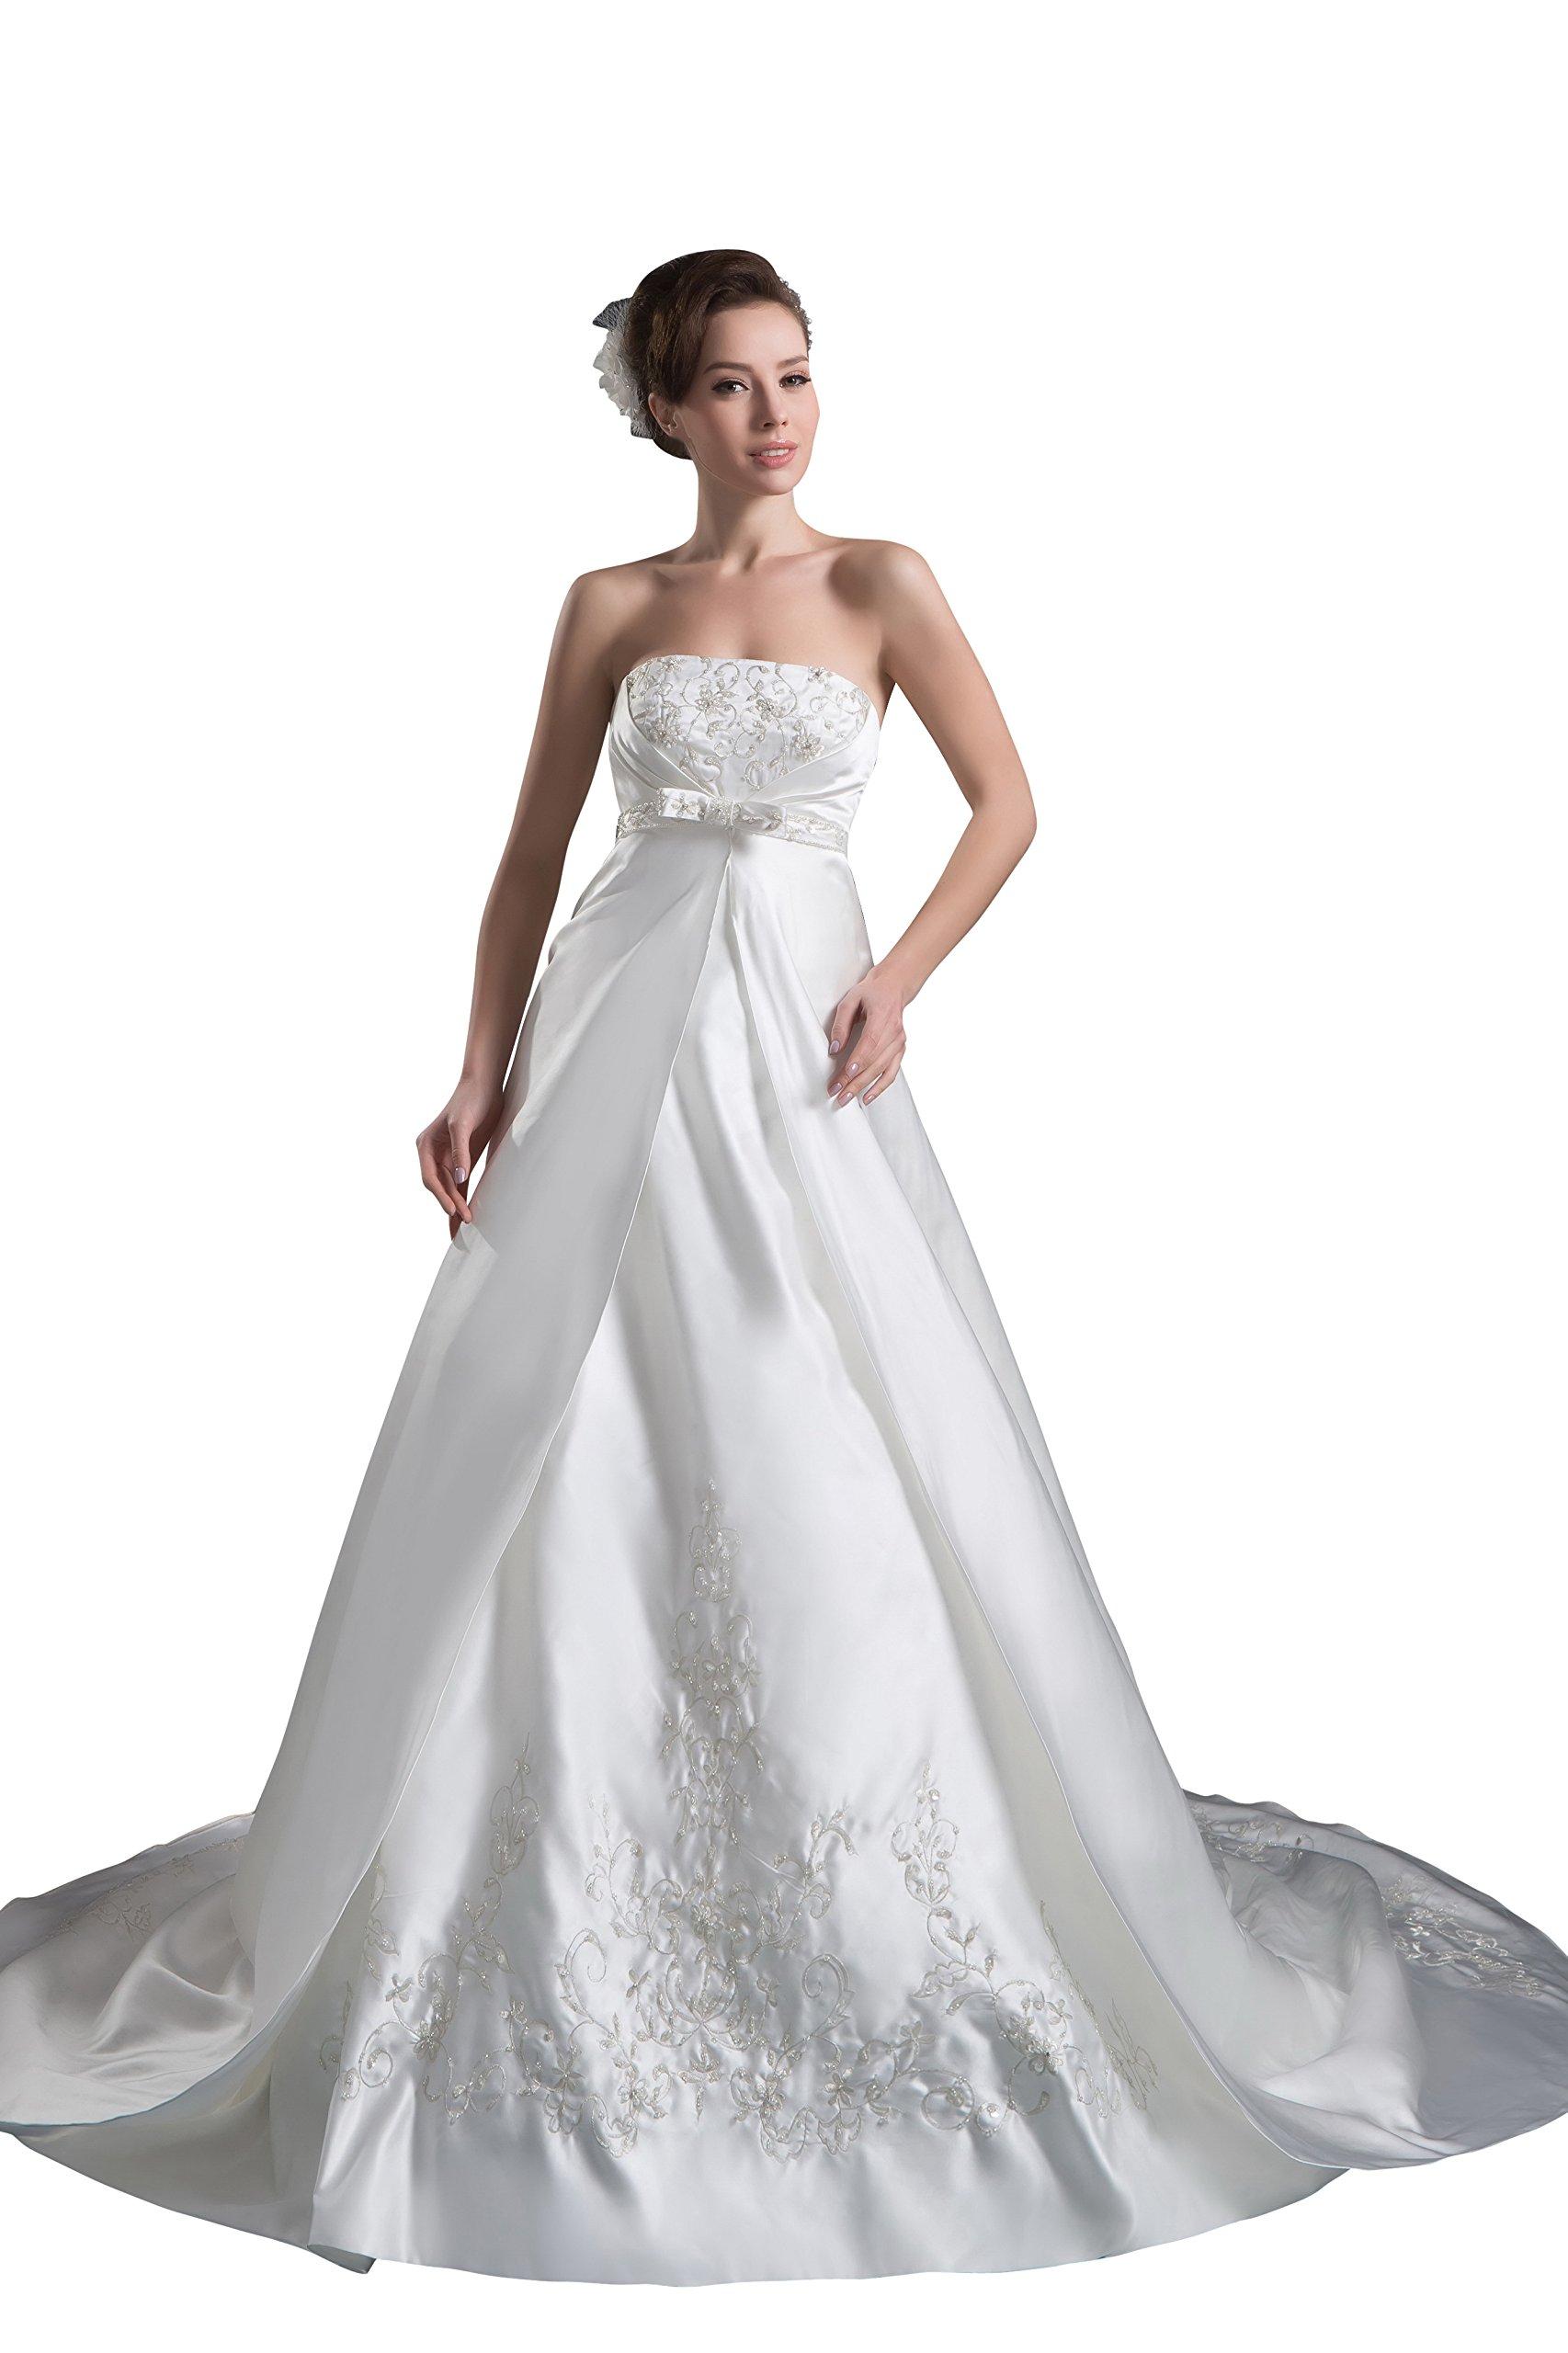 Vogue007 Womens Strapless Silk Taffeta Wedding Dress with Embroidery, White, Customized